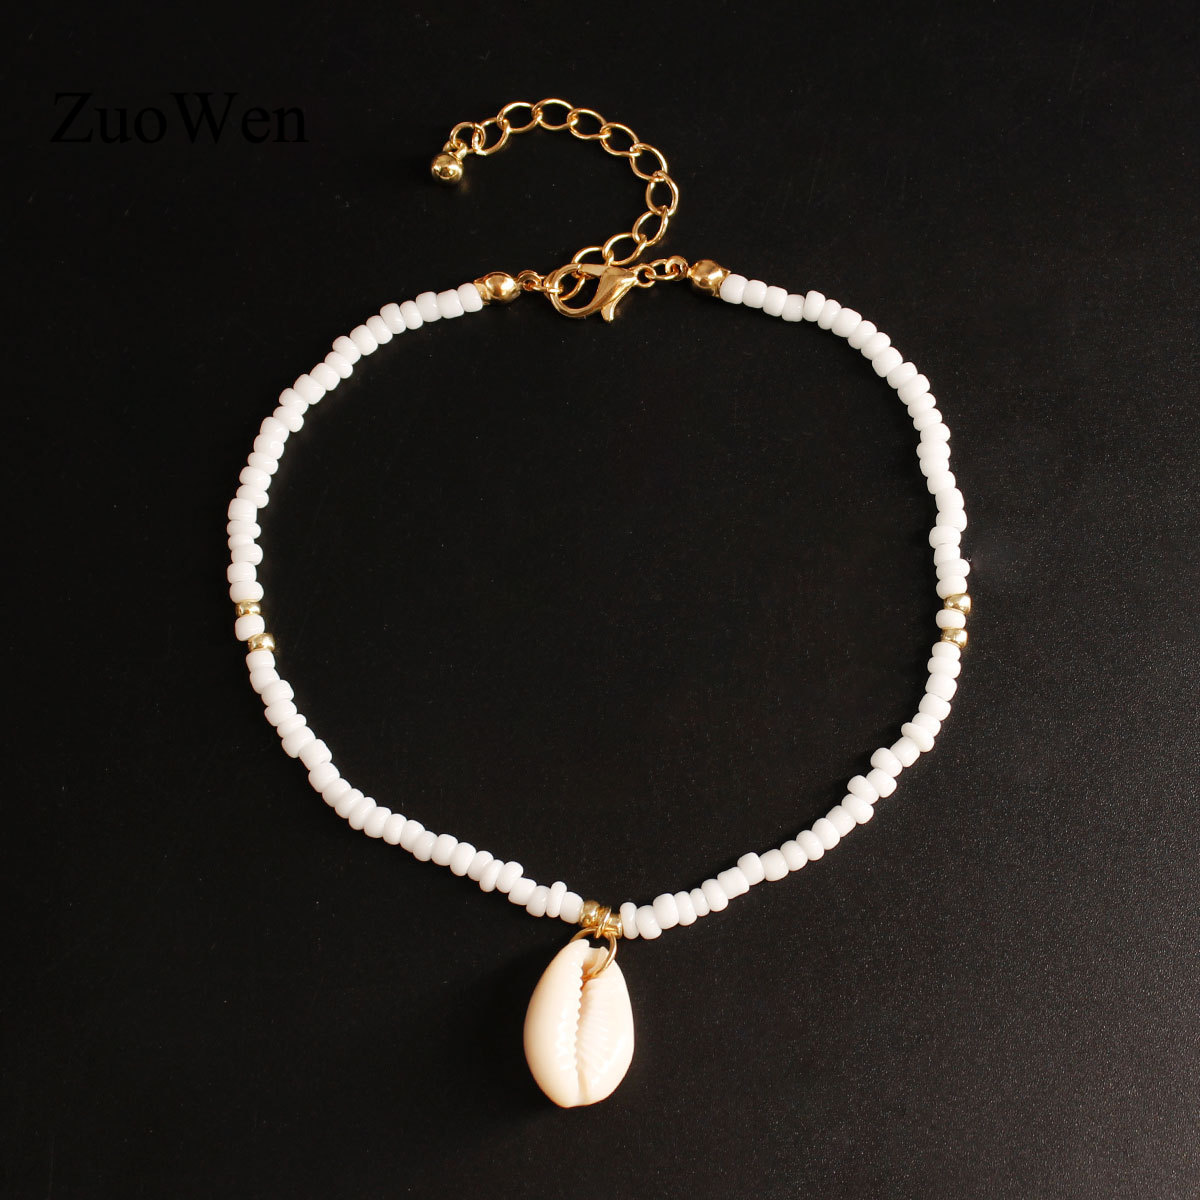 Bohemia White Seed Beads Foot Leg Ankle Bracelet Handmade Beaded Ocean Beach Natural Shell Anklets For Women Beach Jewelry K249